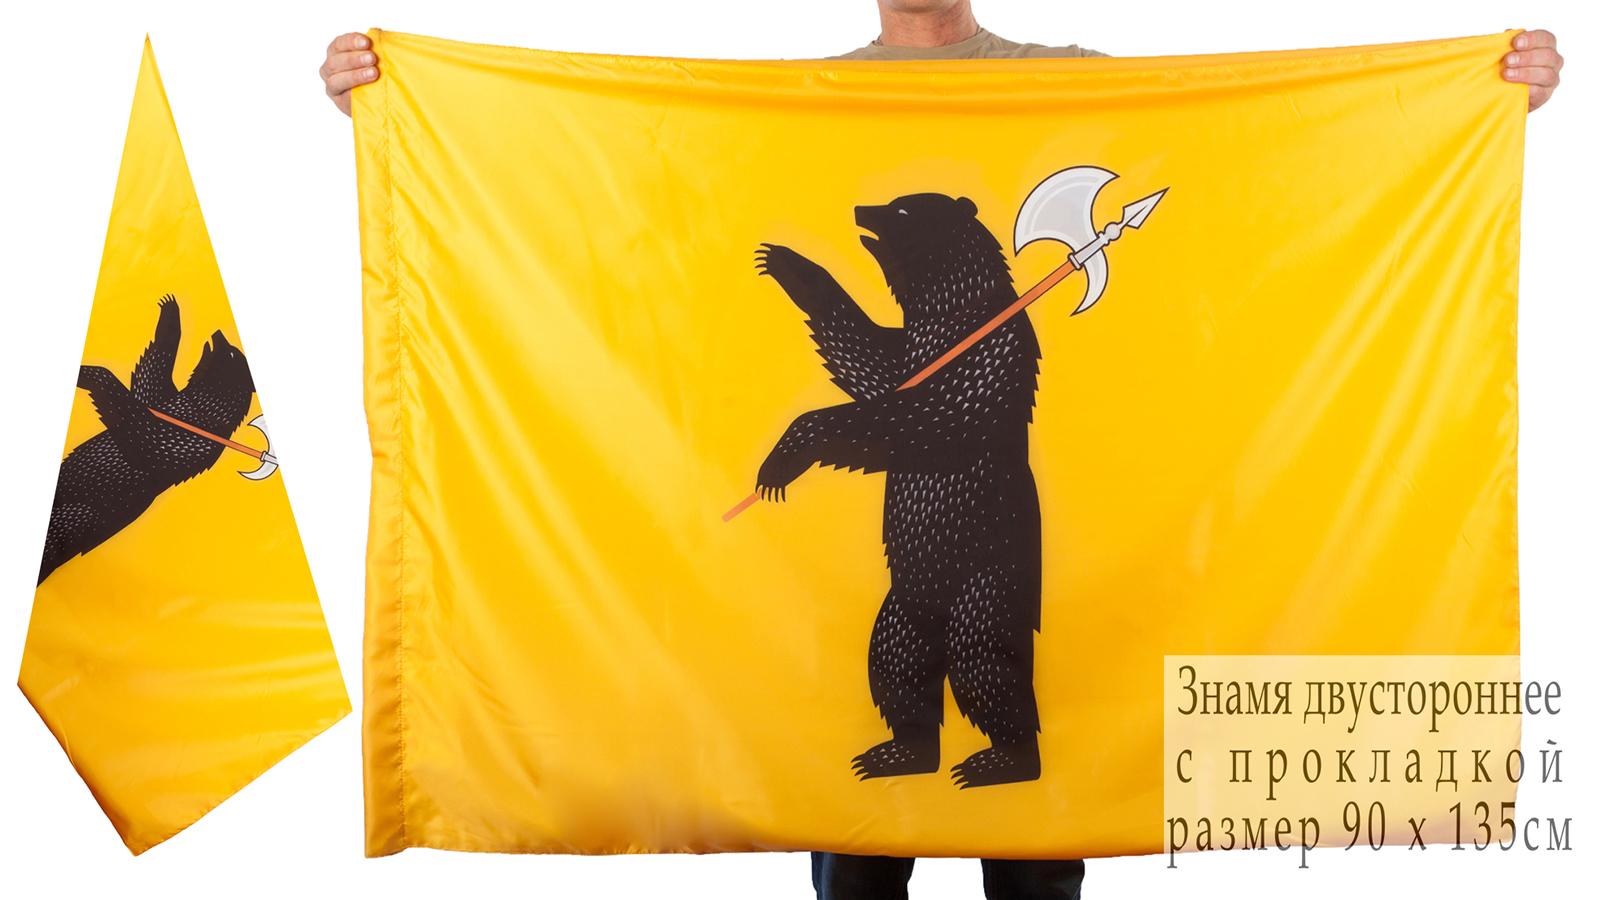 Двухсторонний флаг Ярославской области